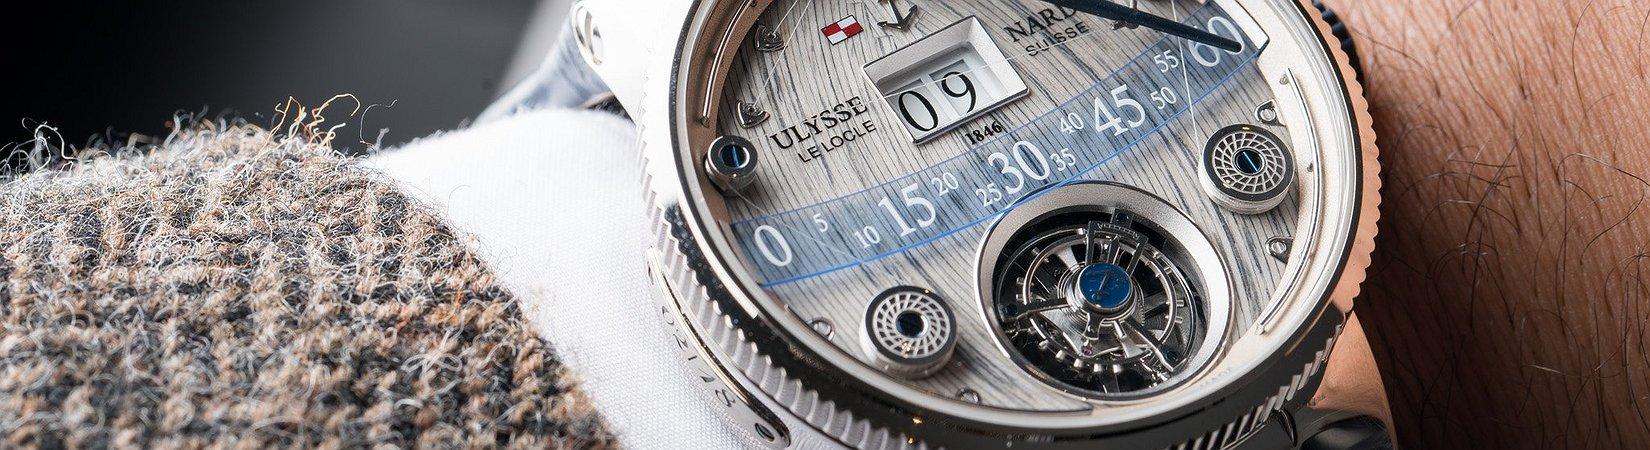 Sechs besondere Uhrmodelle